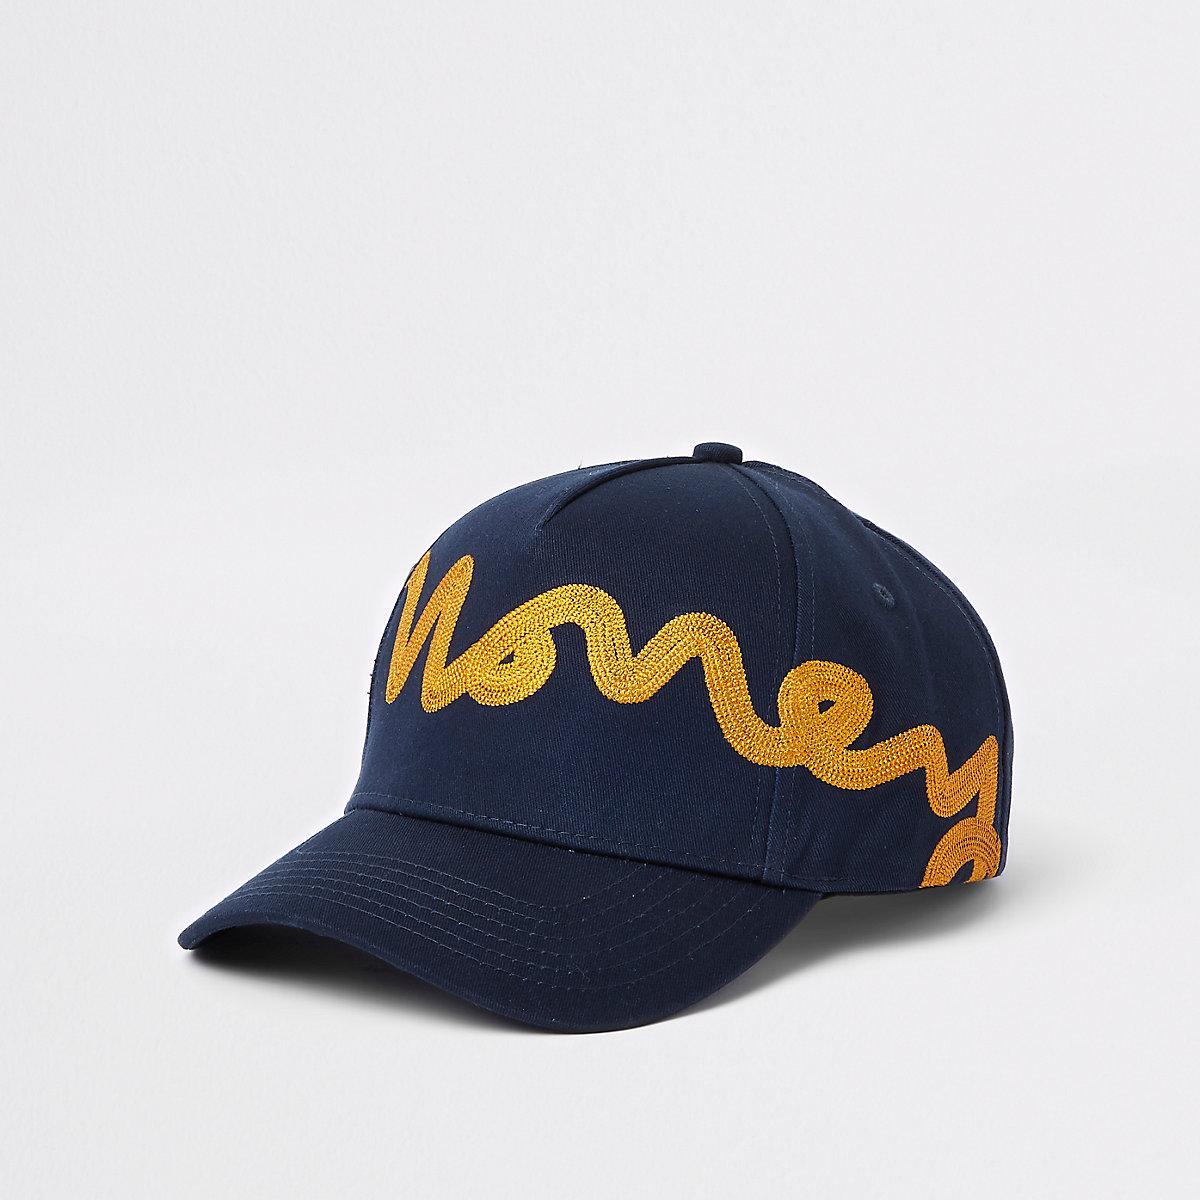 Money Clothing navy baseball cap